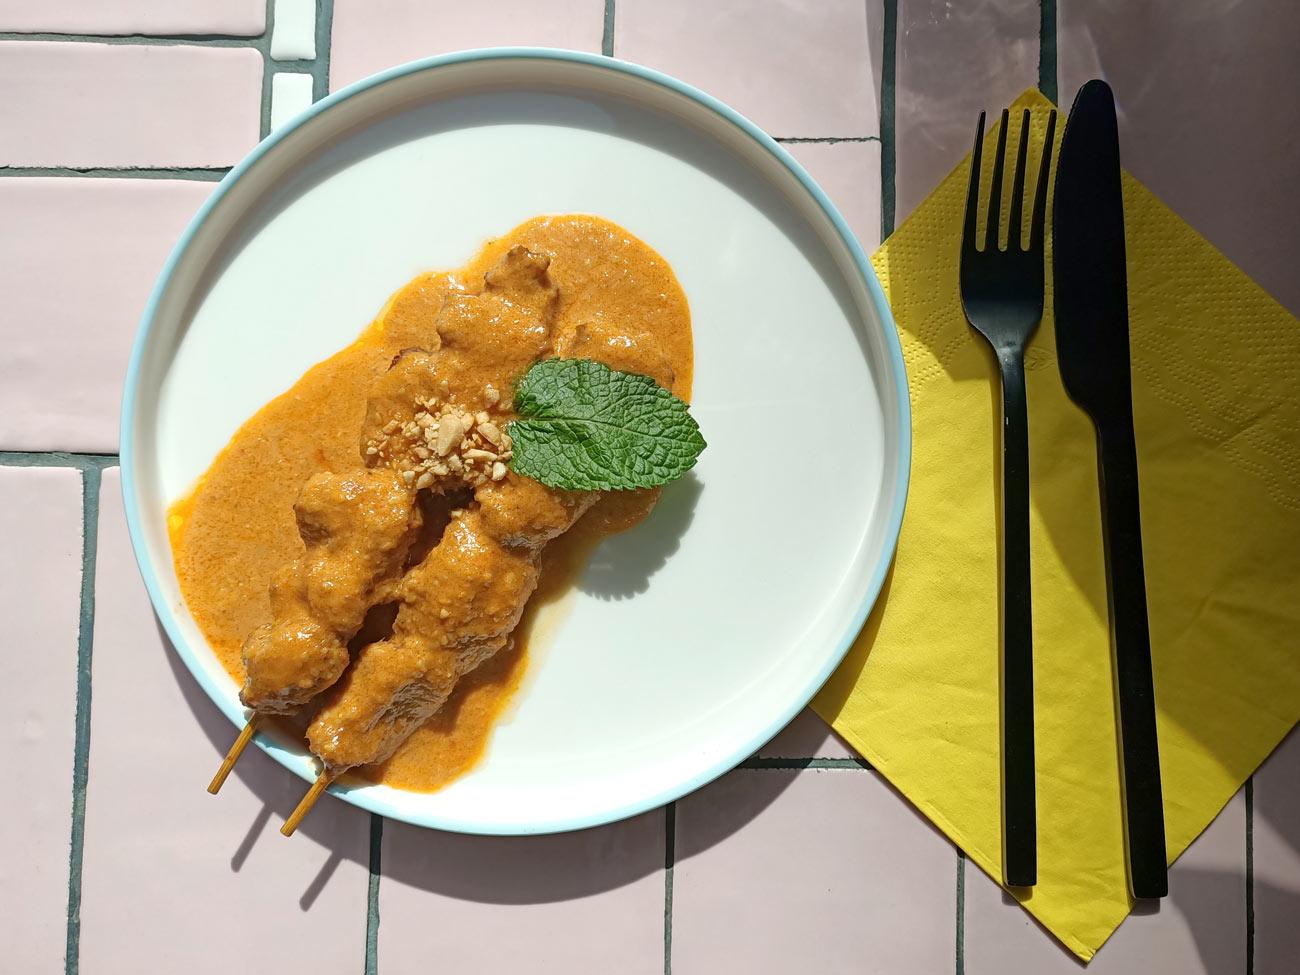 Gingembre, restaurant vietnamien à Marseille : sbrochettes